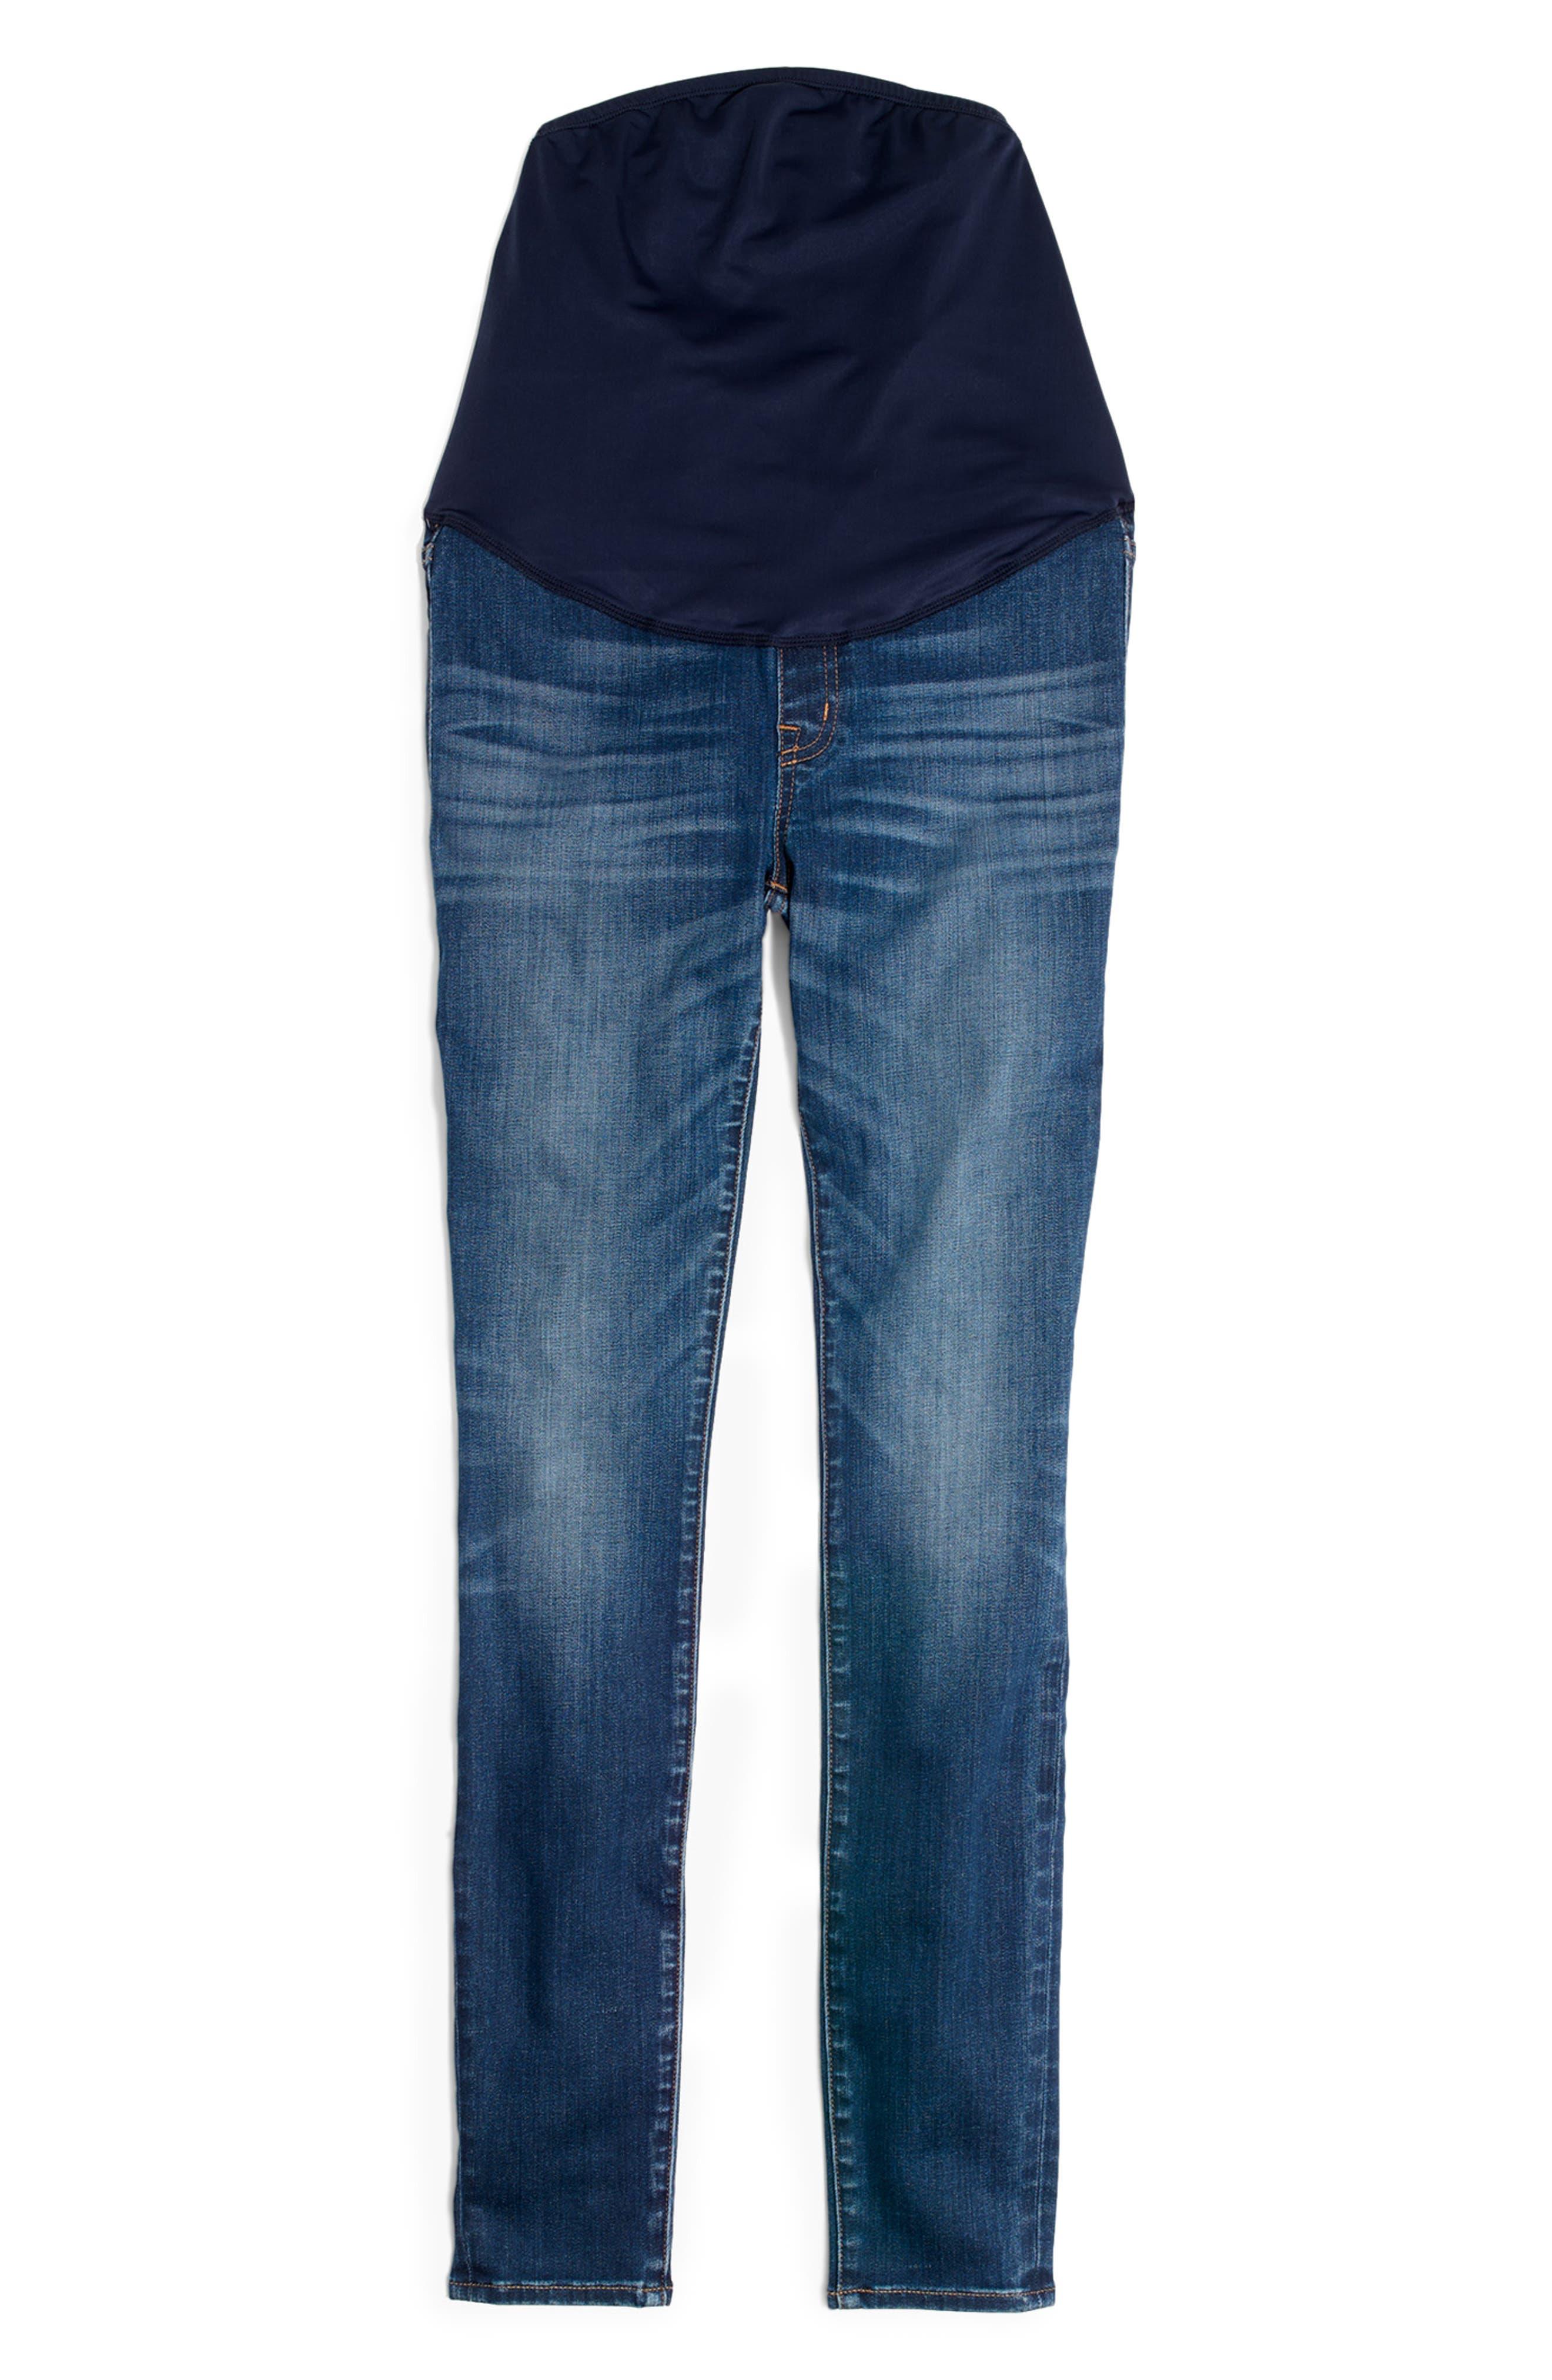 Maternity Skinny Jeans,                             Alternate thumbnail 5, color,                             DANNY